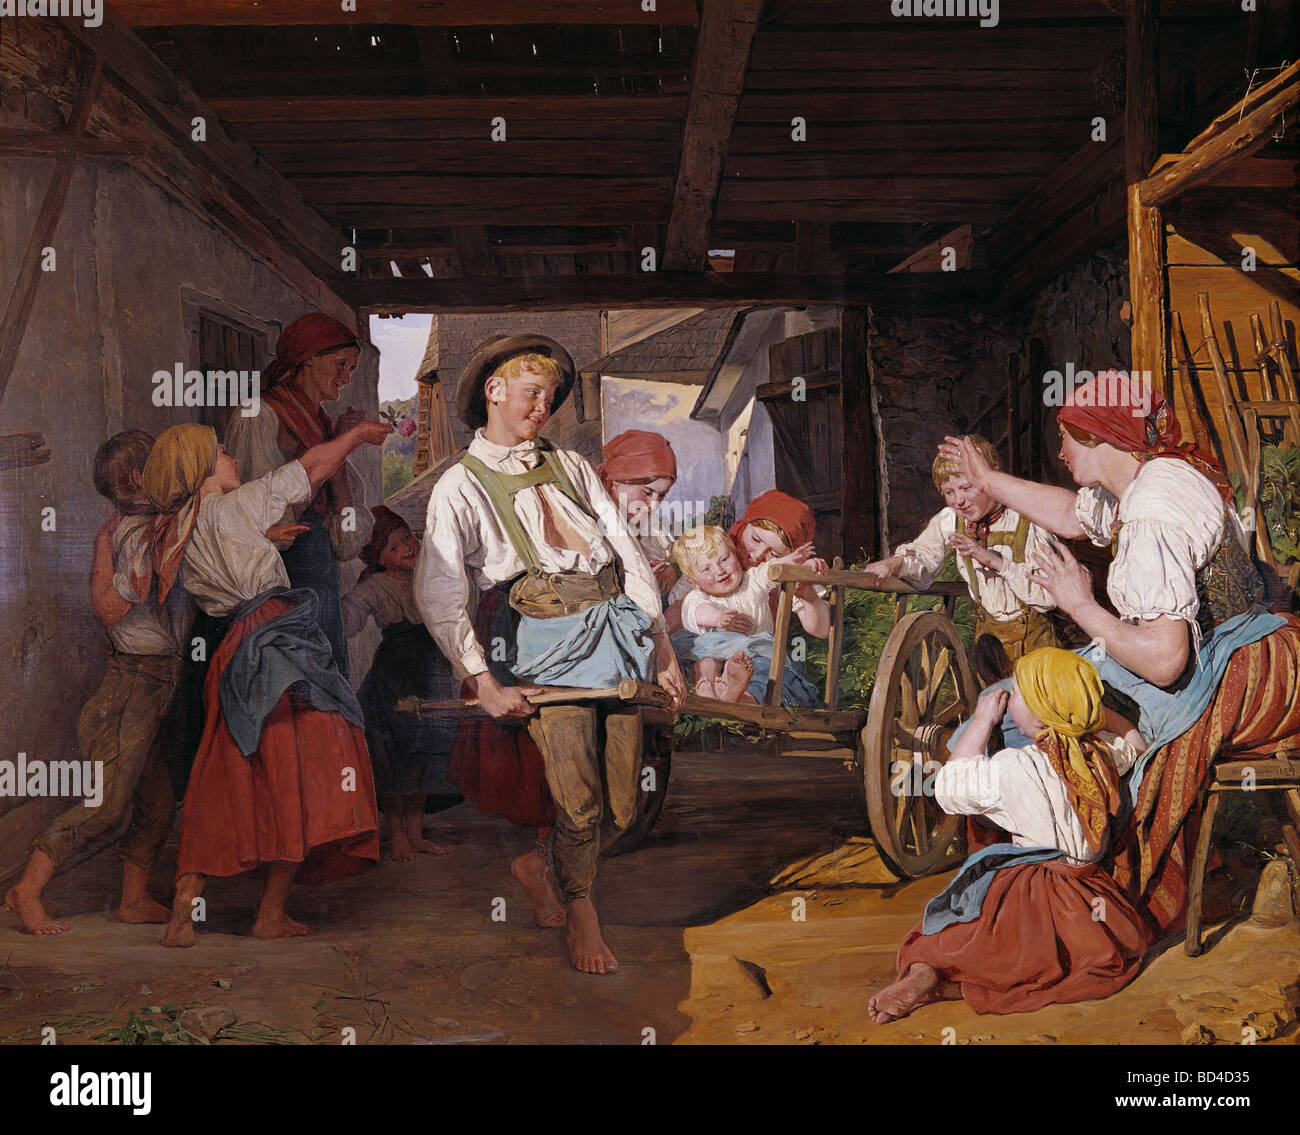 fine arts, Waldmueller, Ferdinand Georg (1793 - 1865), painting, 'Hansel's erste Ausfahrt' (Hansel's - Stock Image